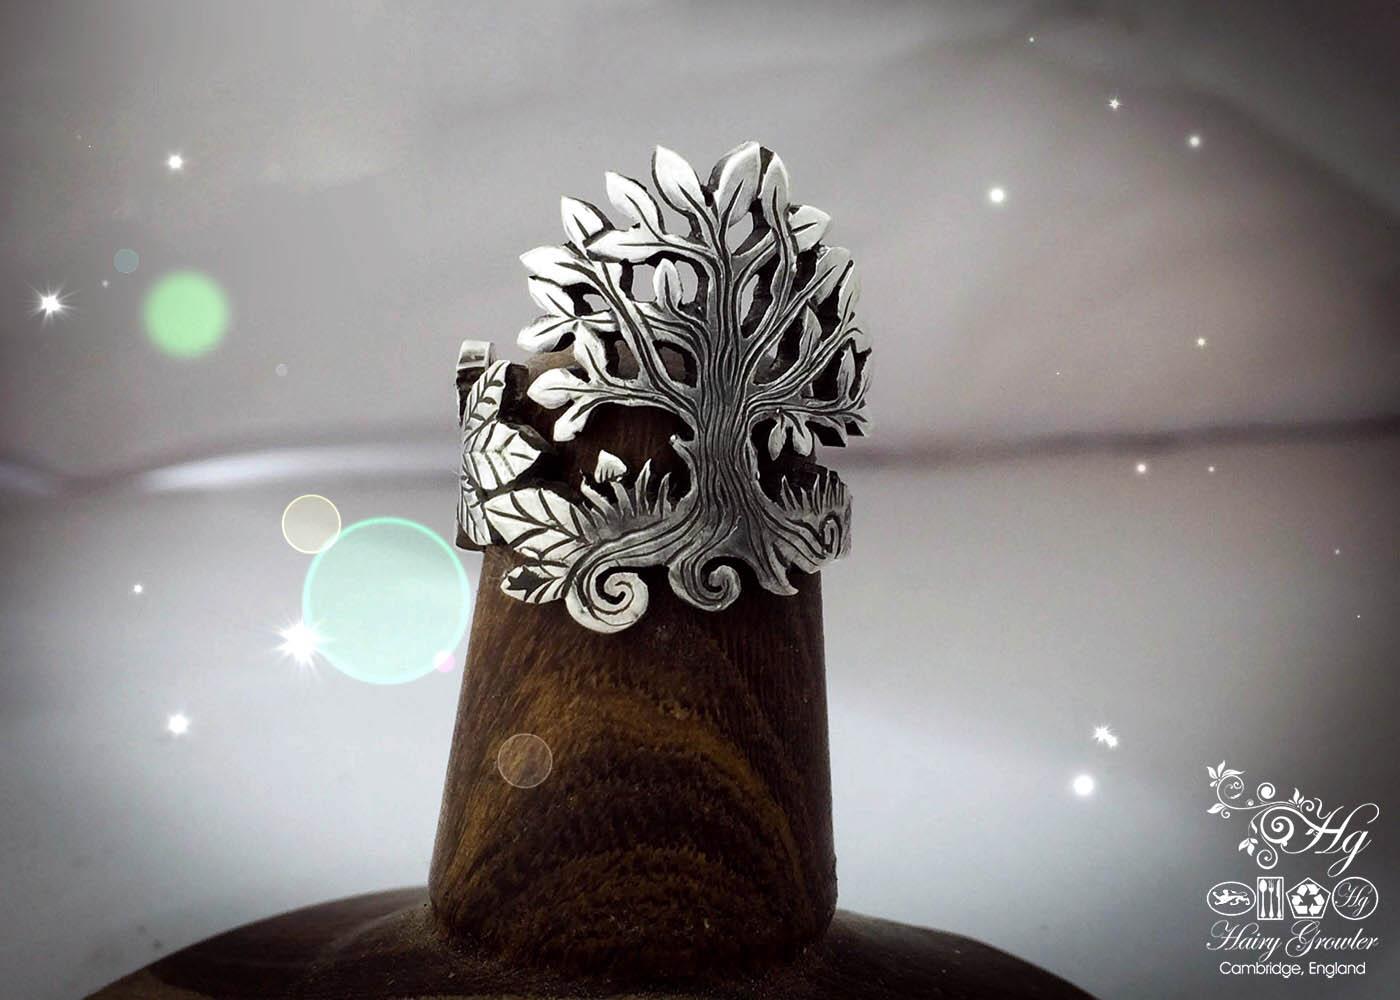 eco-friendly, nature loving tree jewellery